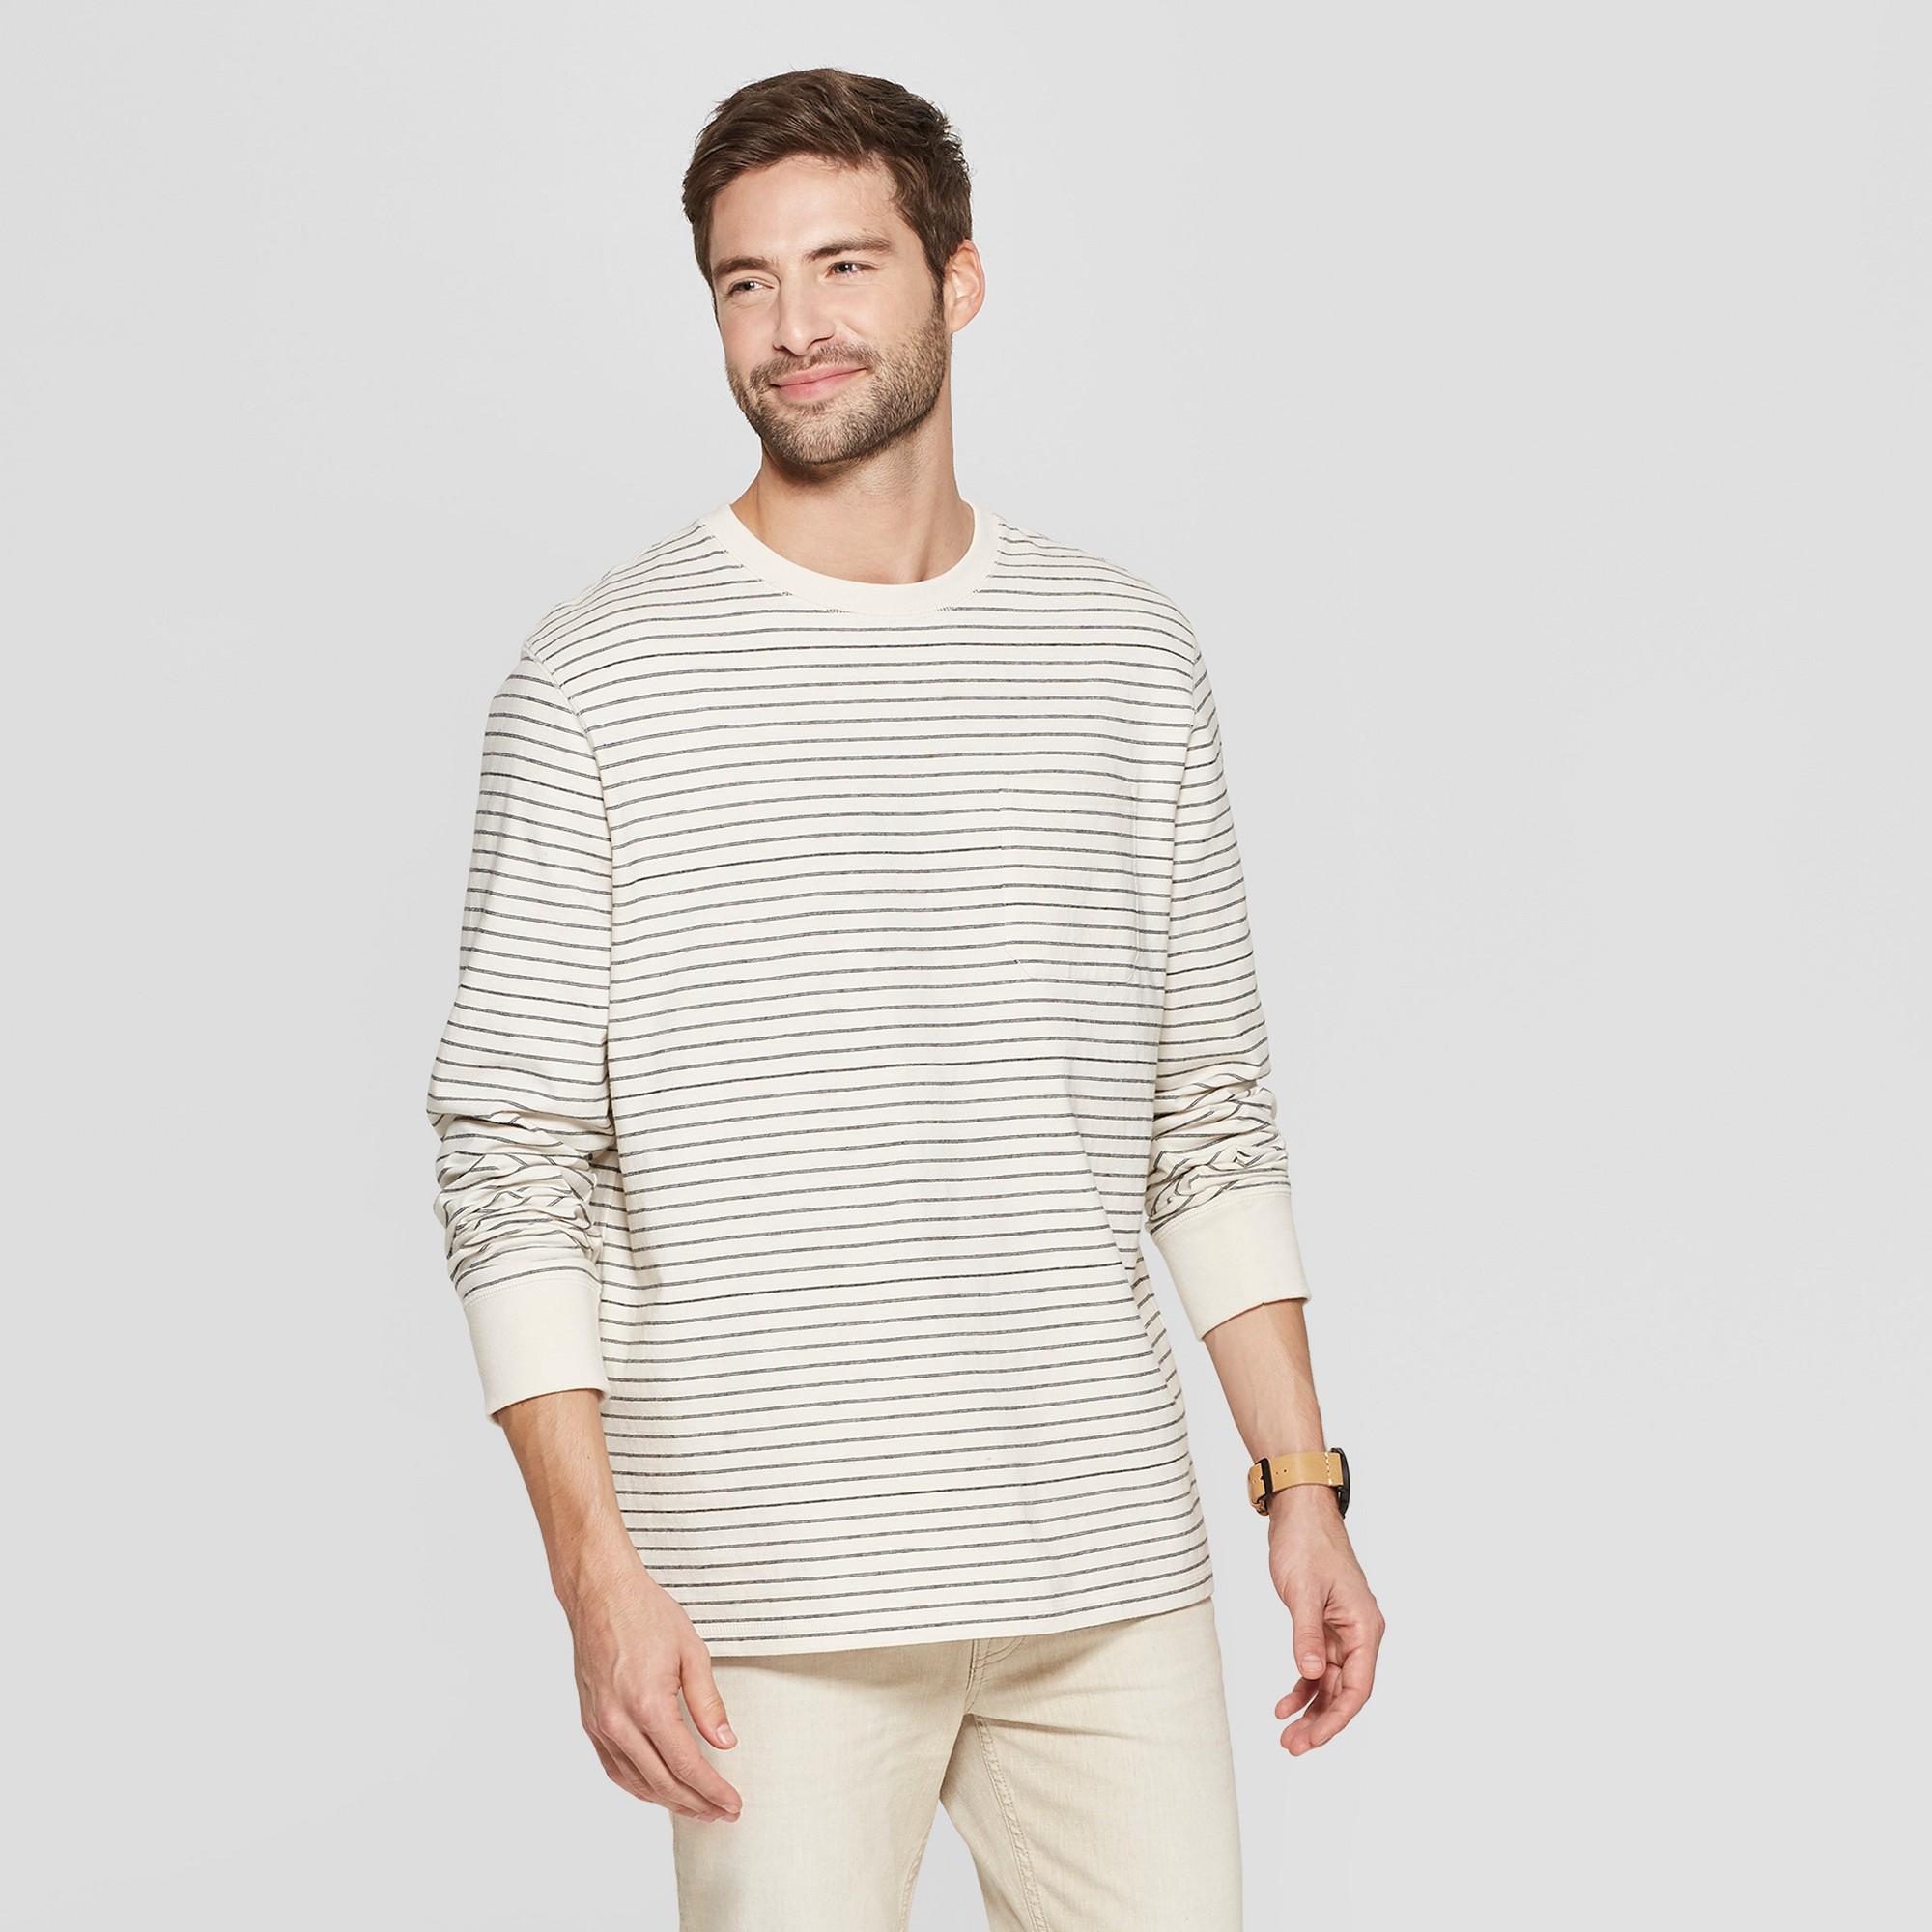 Men's Striped Standard Fit Long Sleeve Garment Dye Pocket T-Shirt - Goodfellow & Co White XL